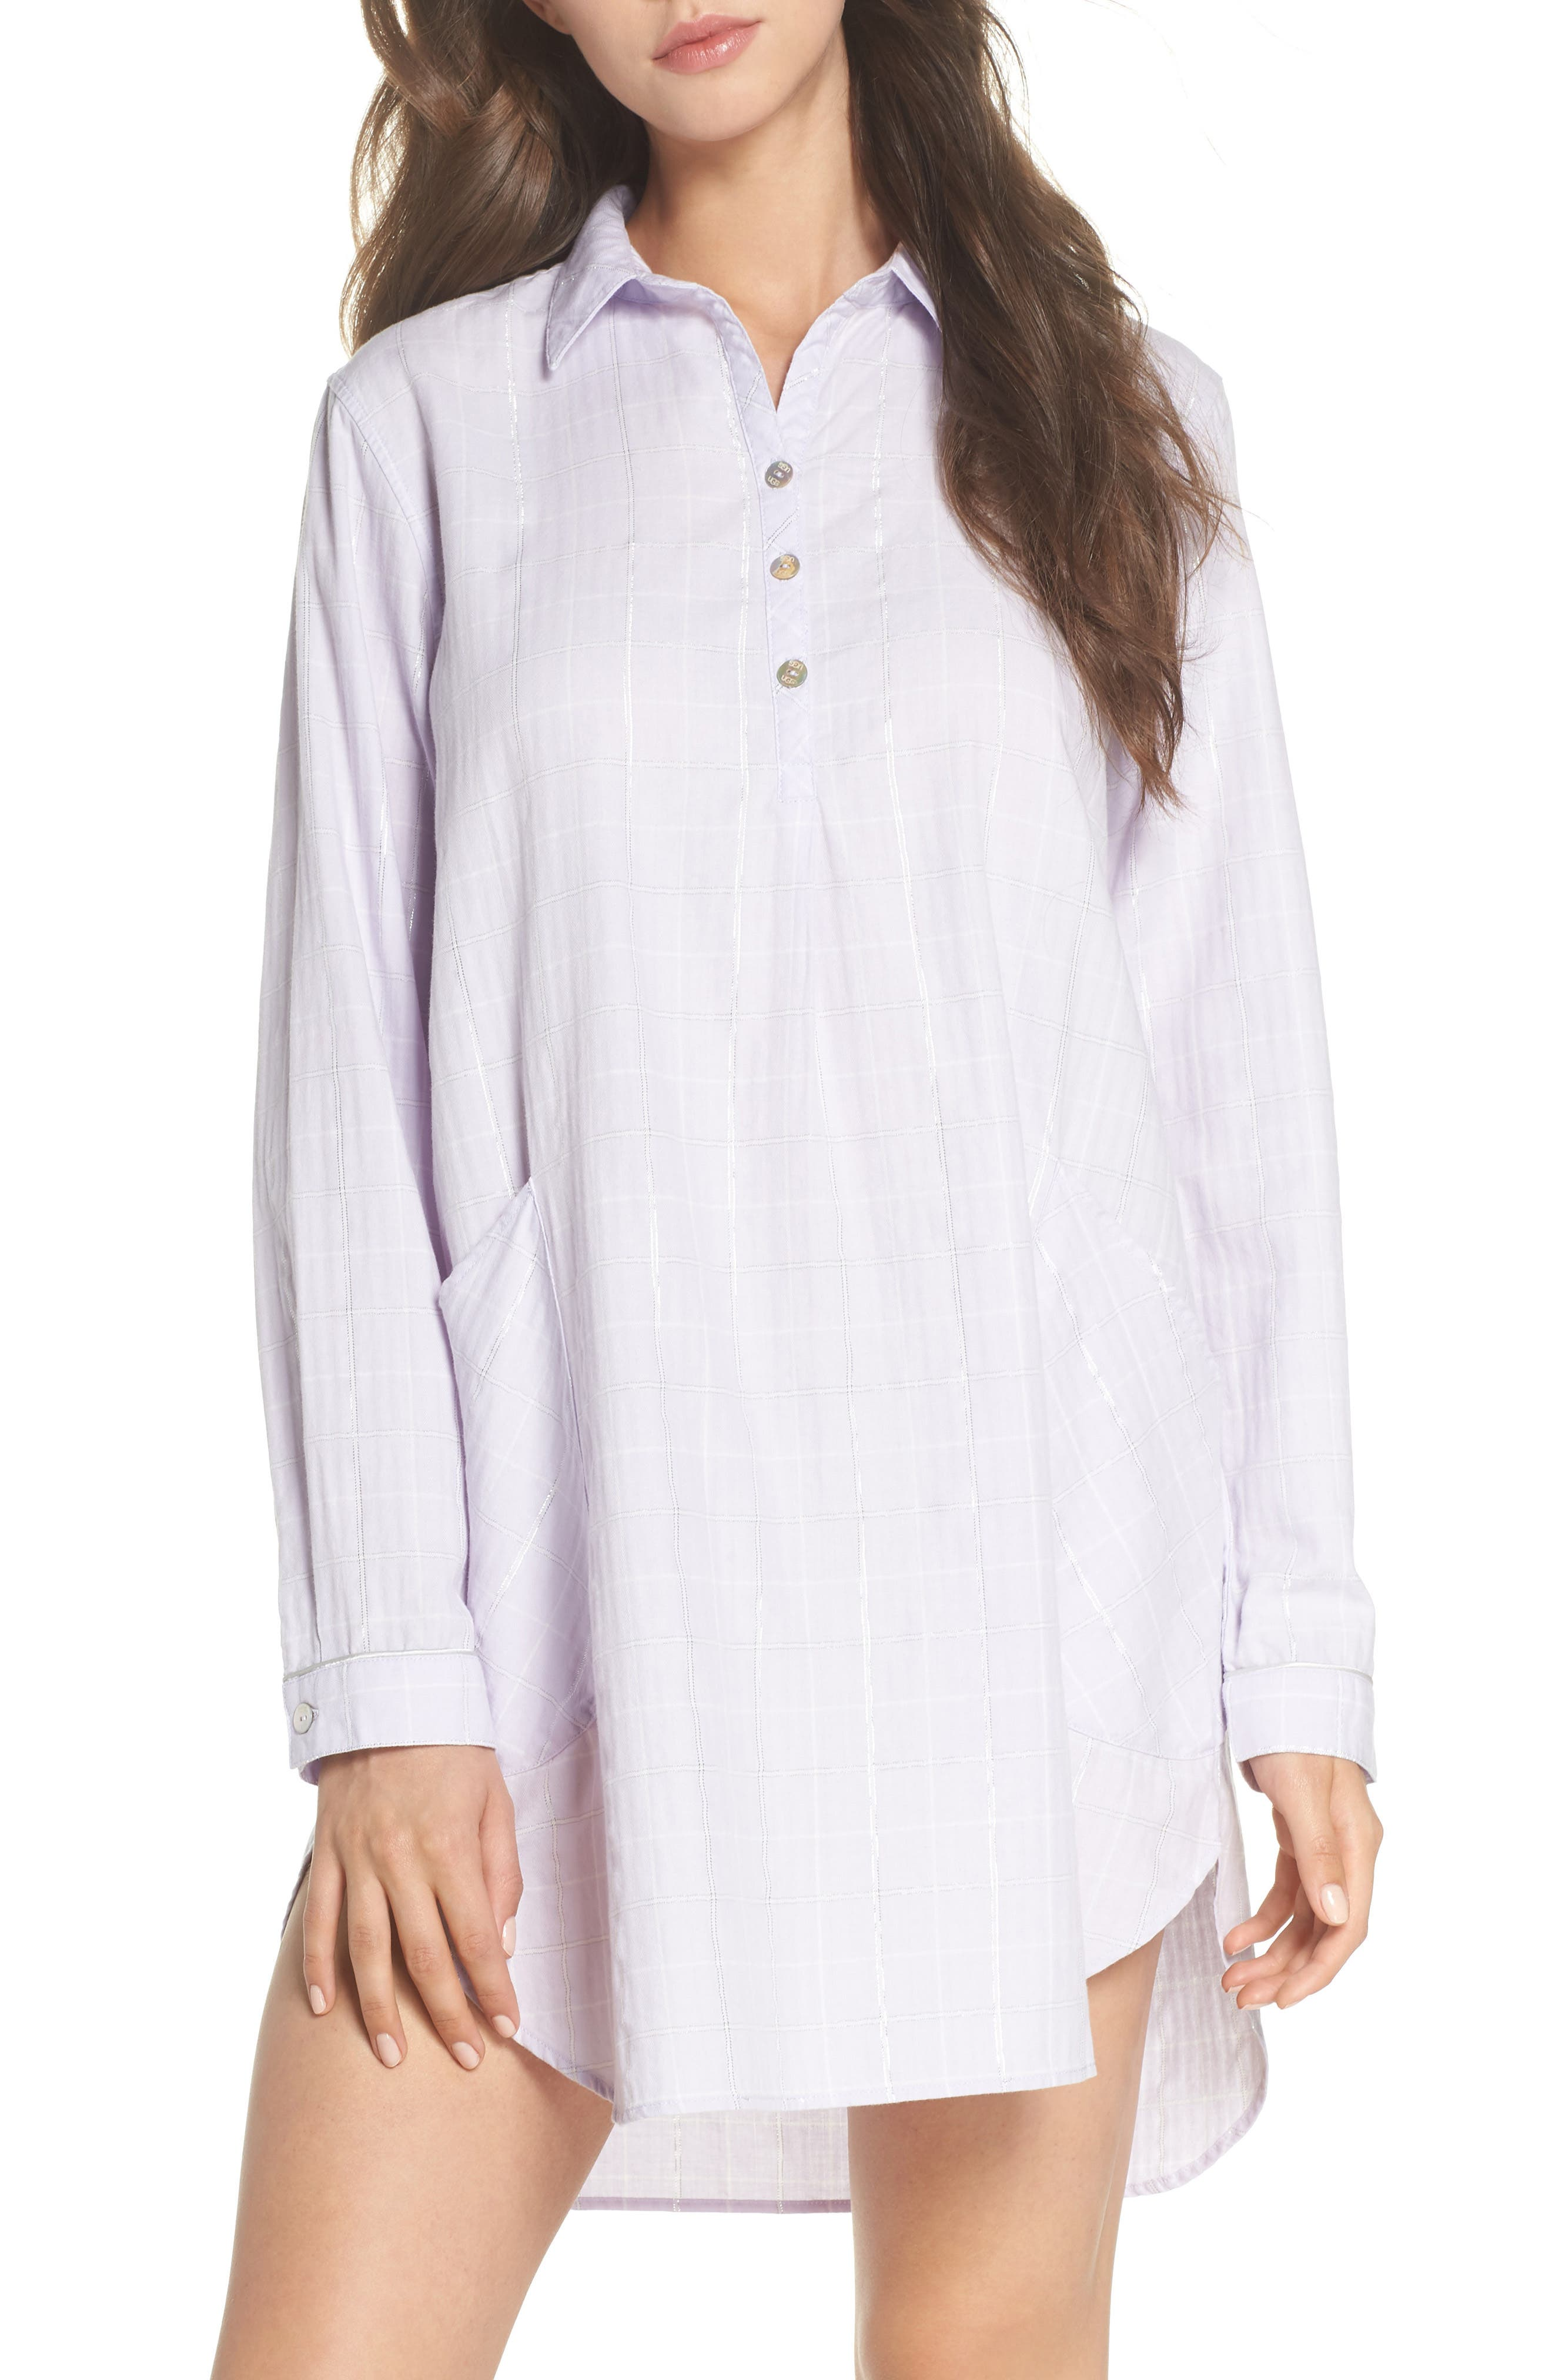 Gabri Sleep Shirt,                             Main thumbnail 1, color,                             LAVENDER FOG